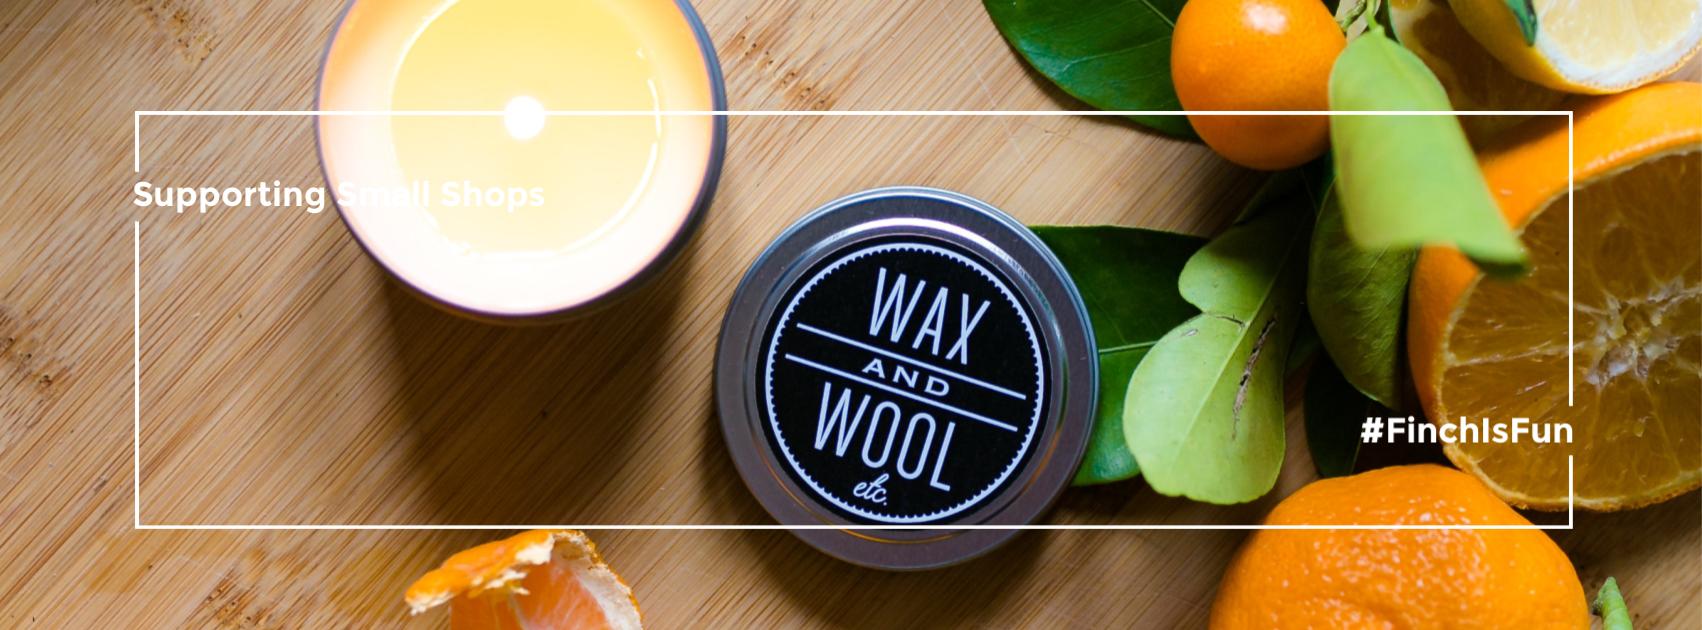 Web Banner - Wax + Wool.png